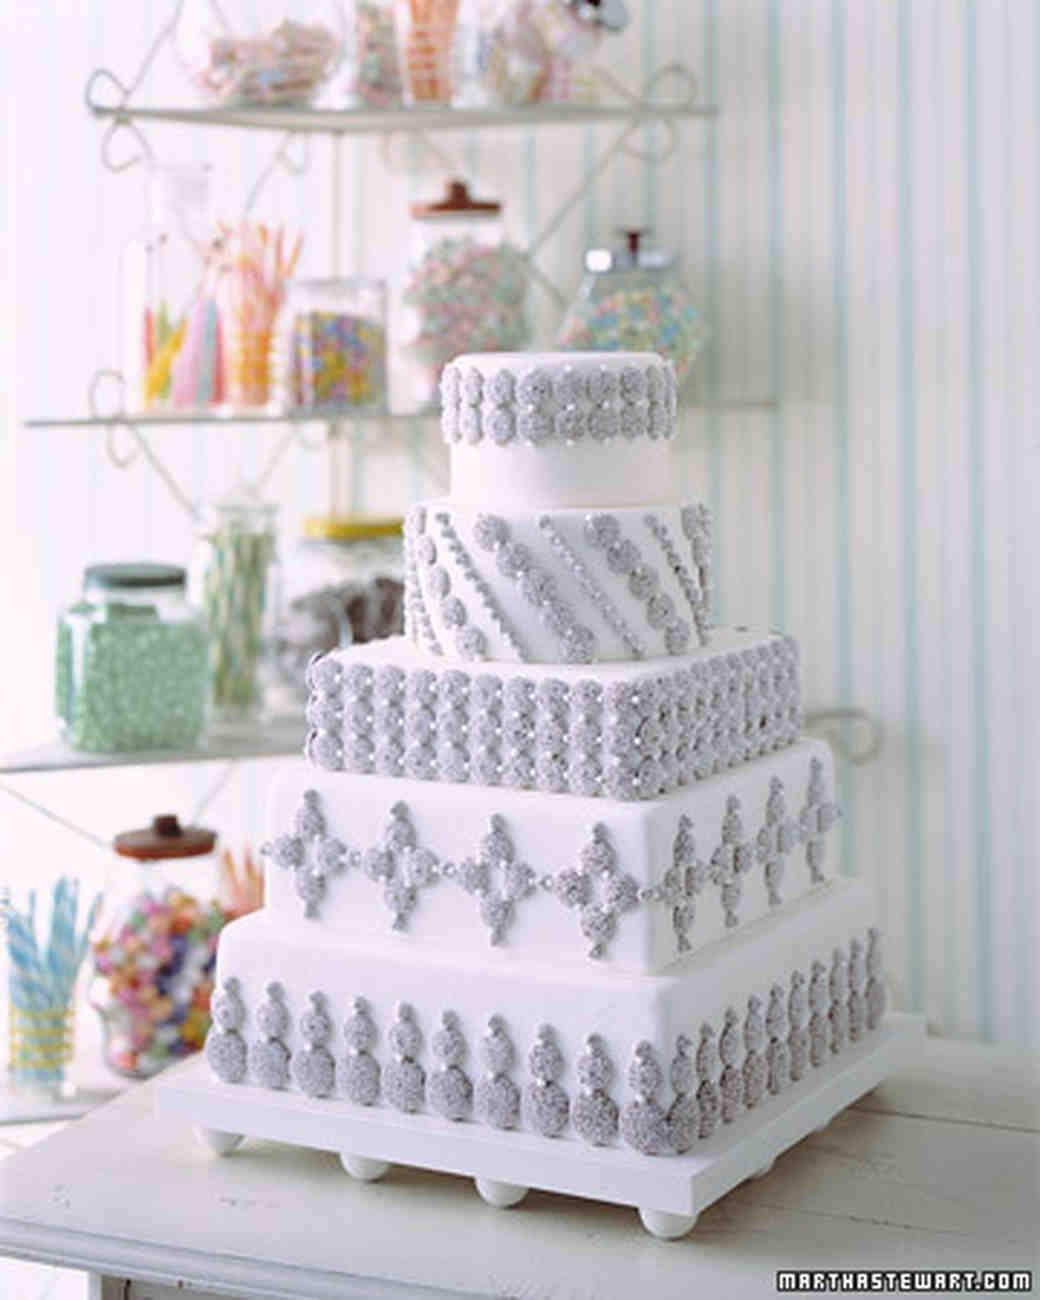 Nonpareil Tower Cake